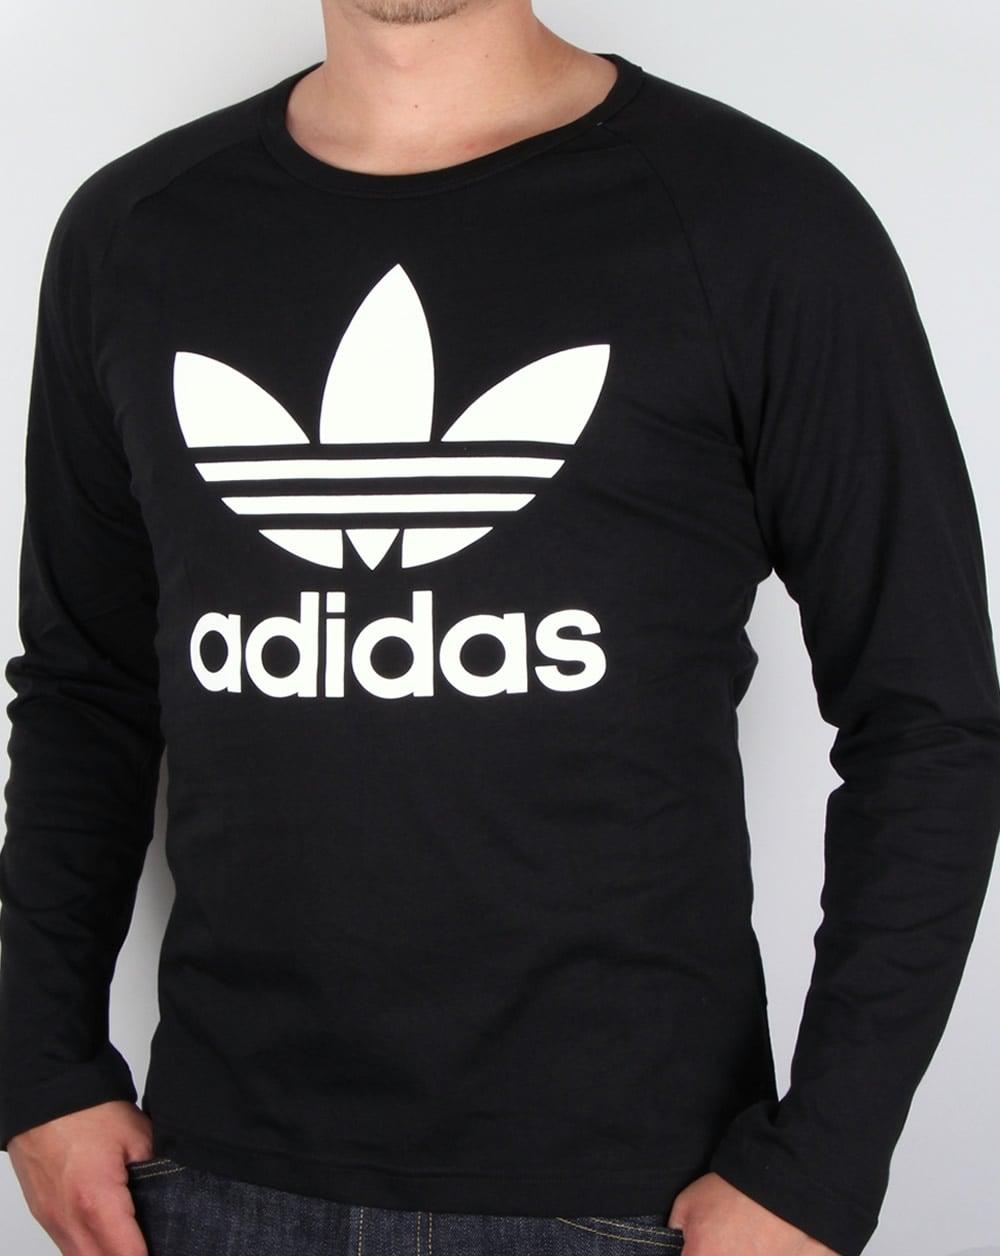 adidas long t shirt